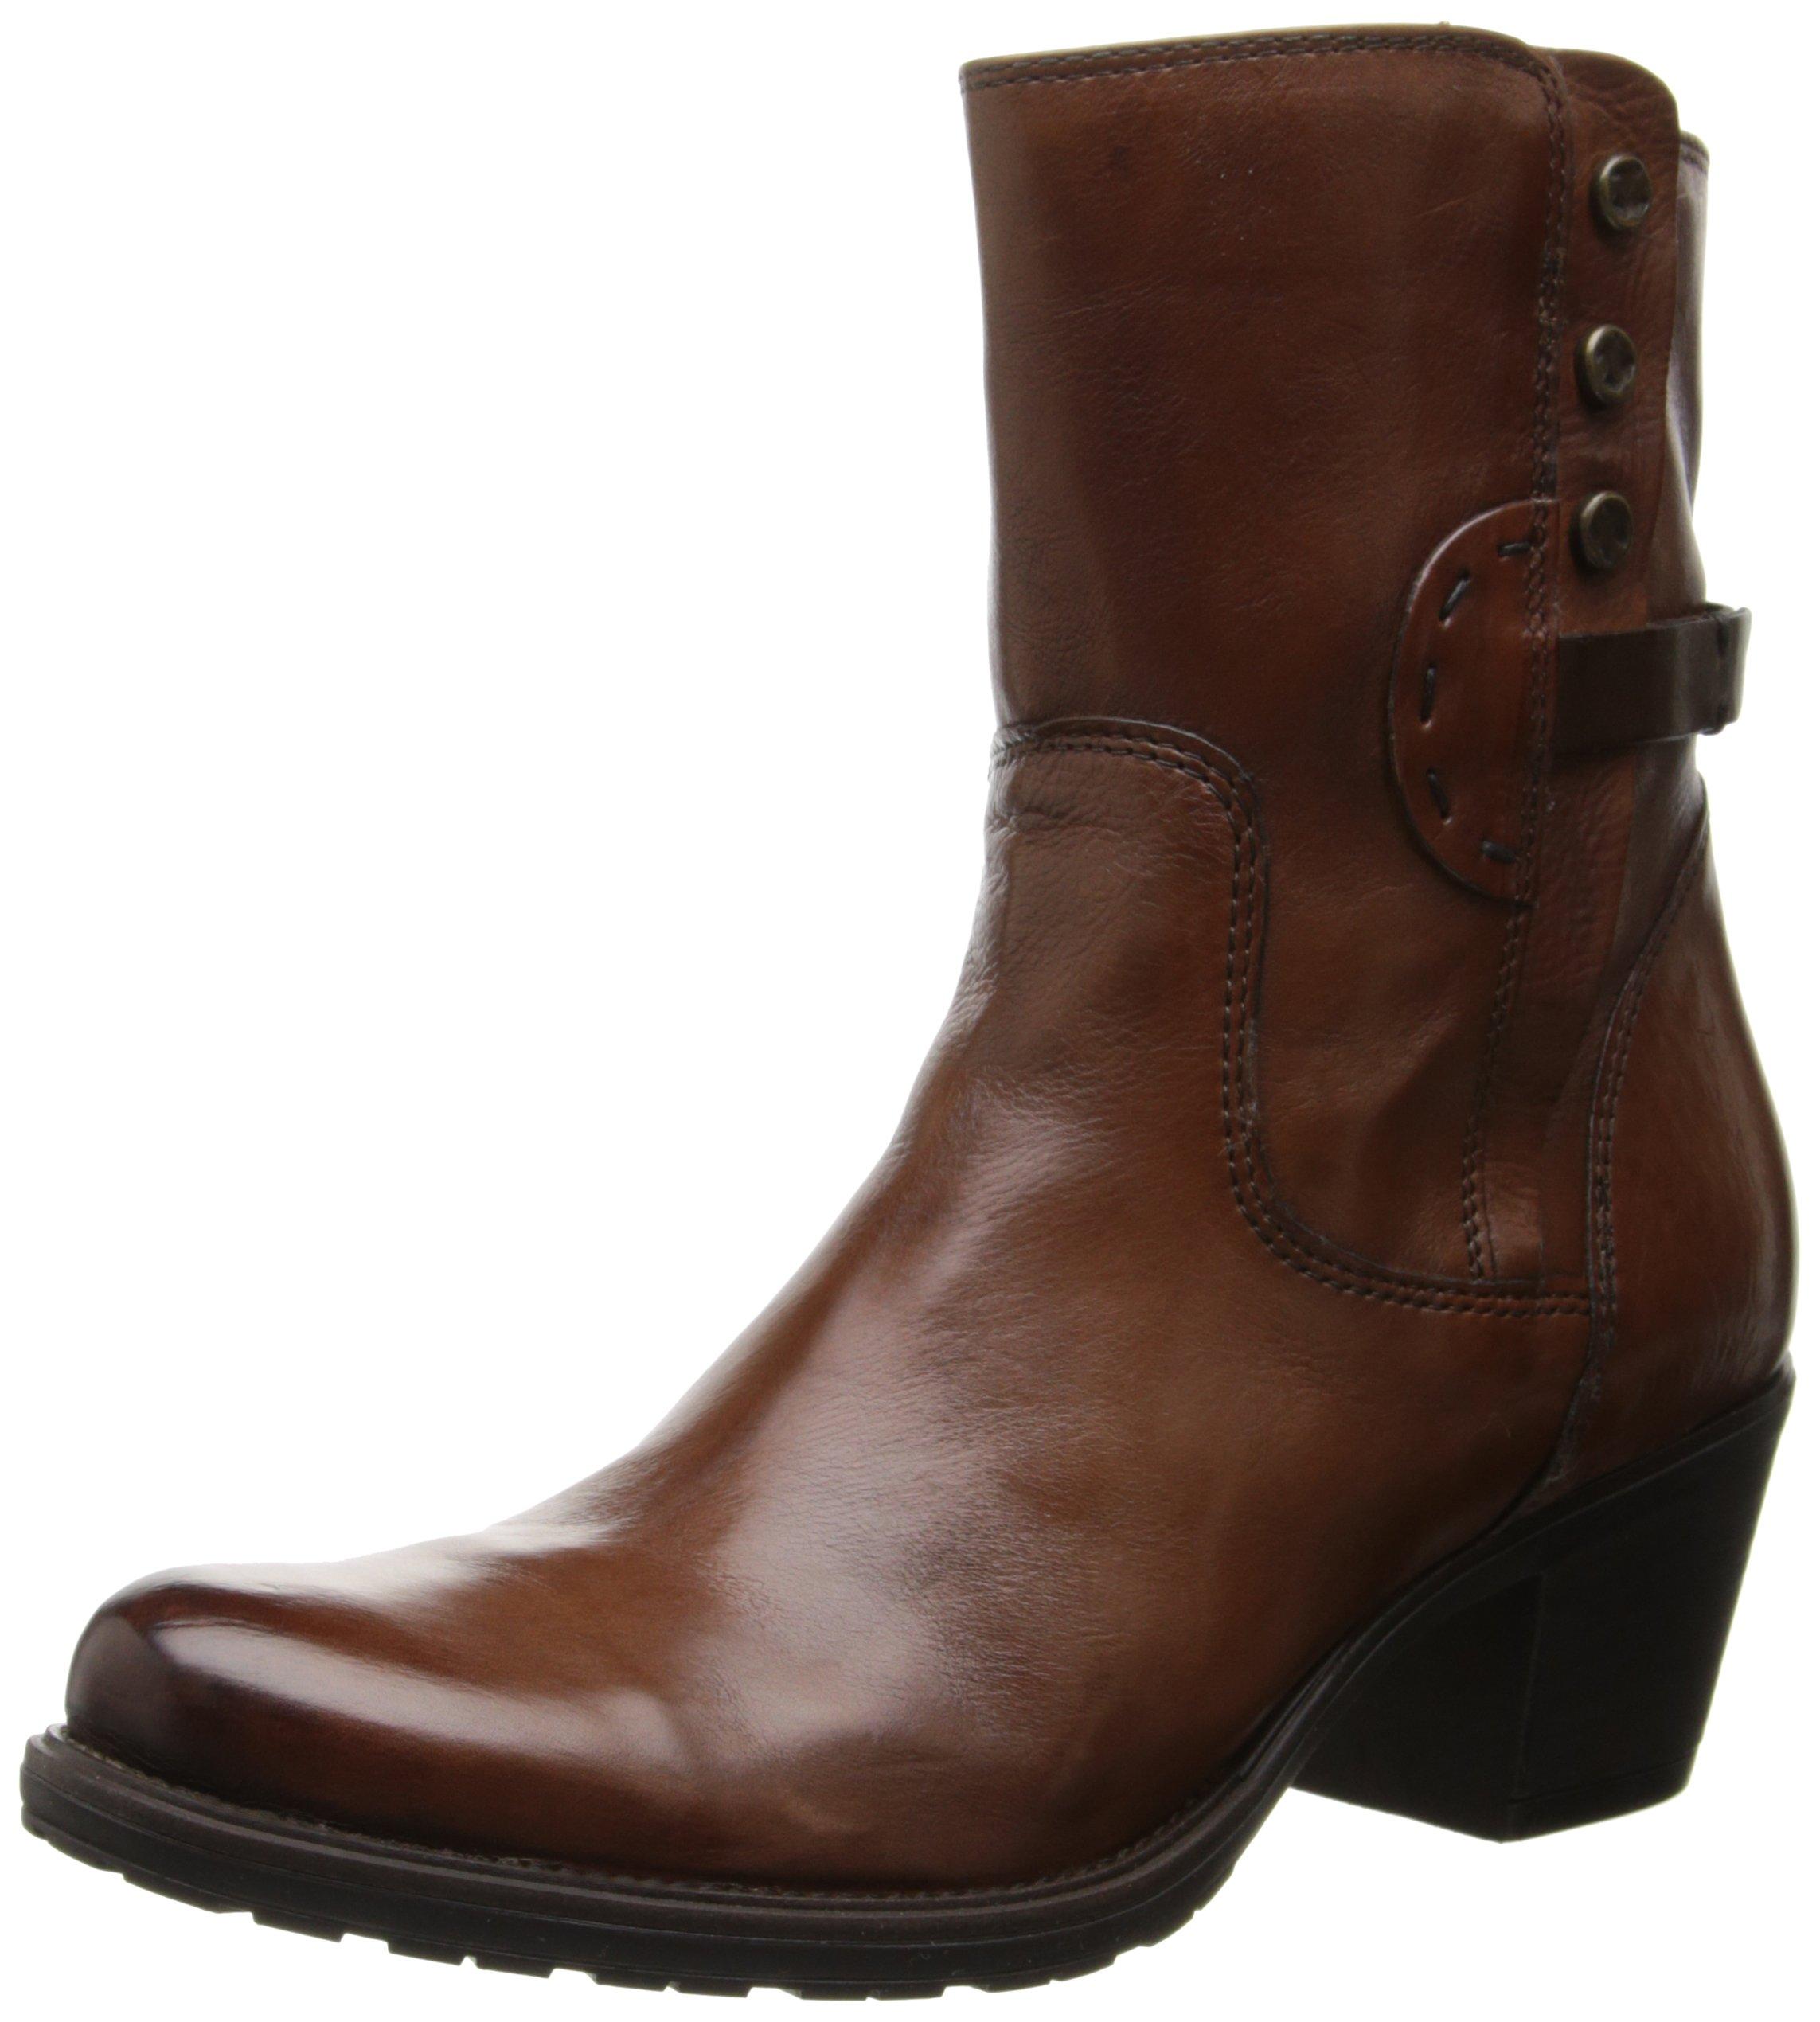 Clarks Women's Maymie Skye Chelsea Boot,Cognac Leather,9.5 M US